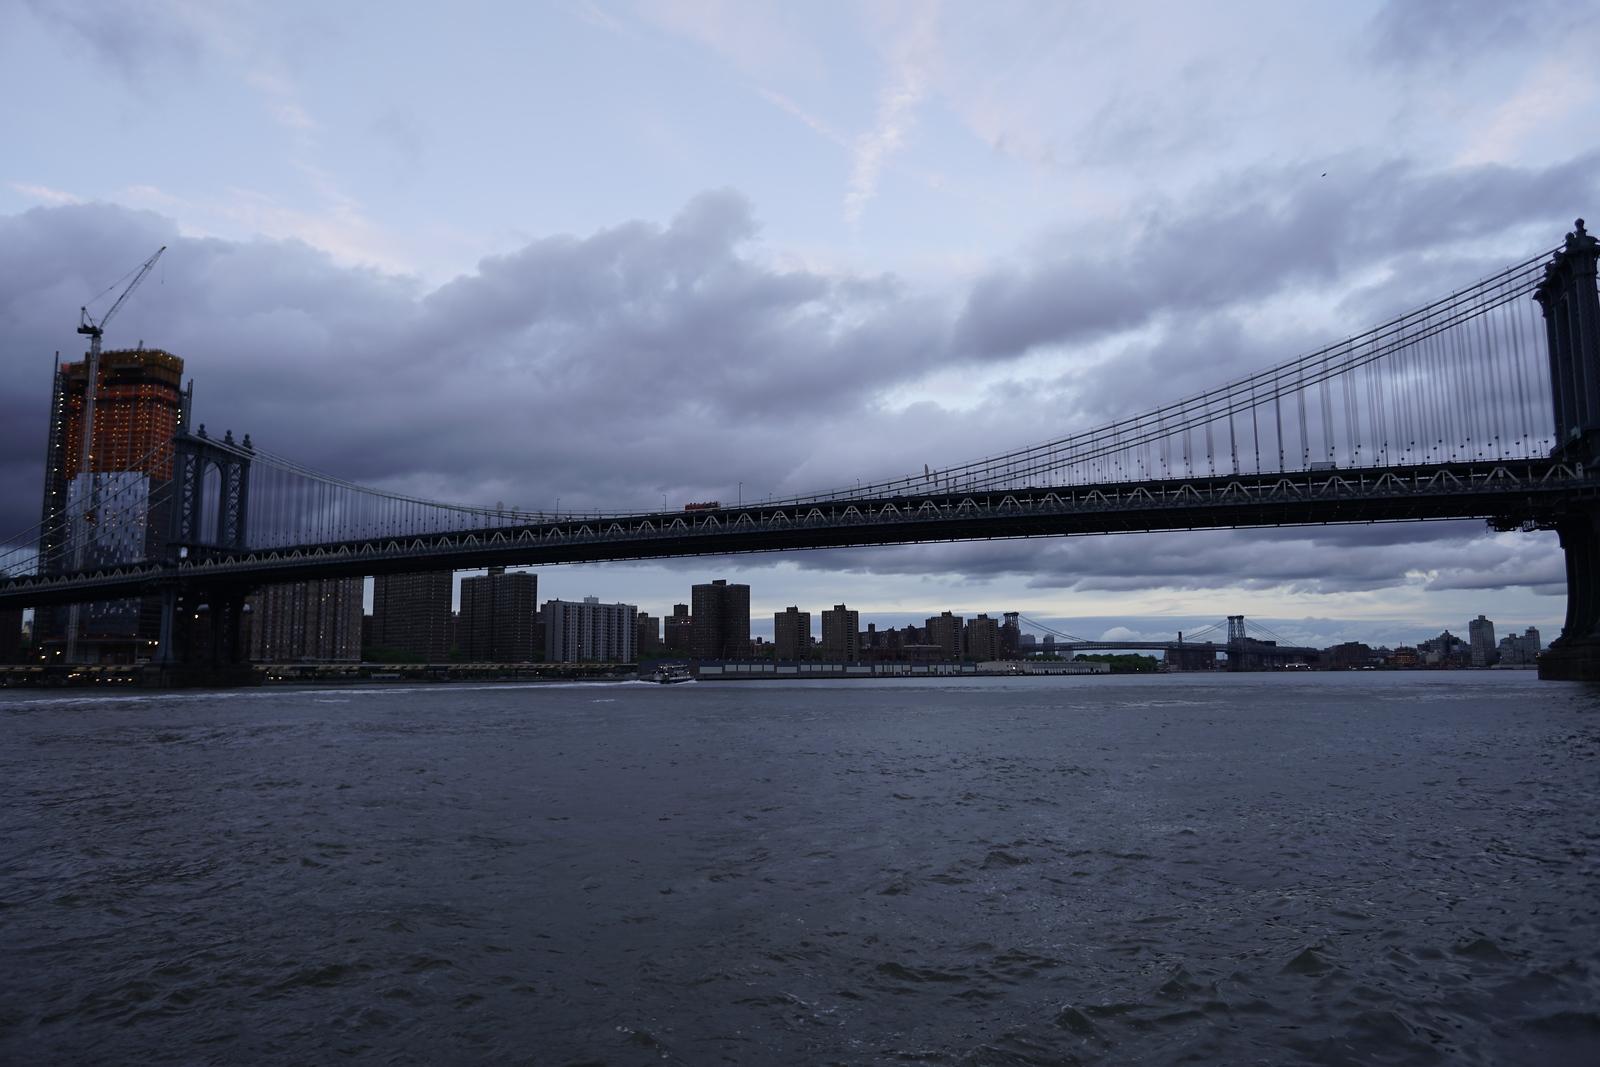 Day 01 -  005 - New York  - Brooklyn Bridge